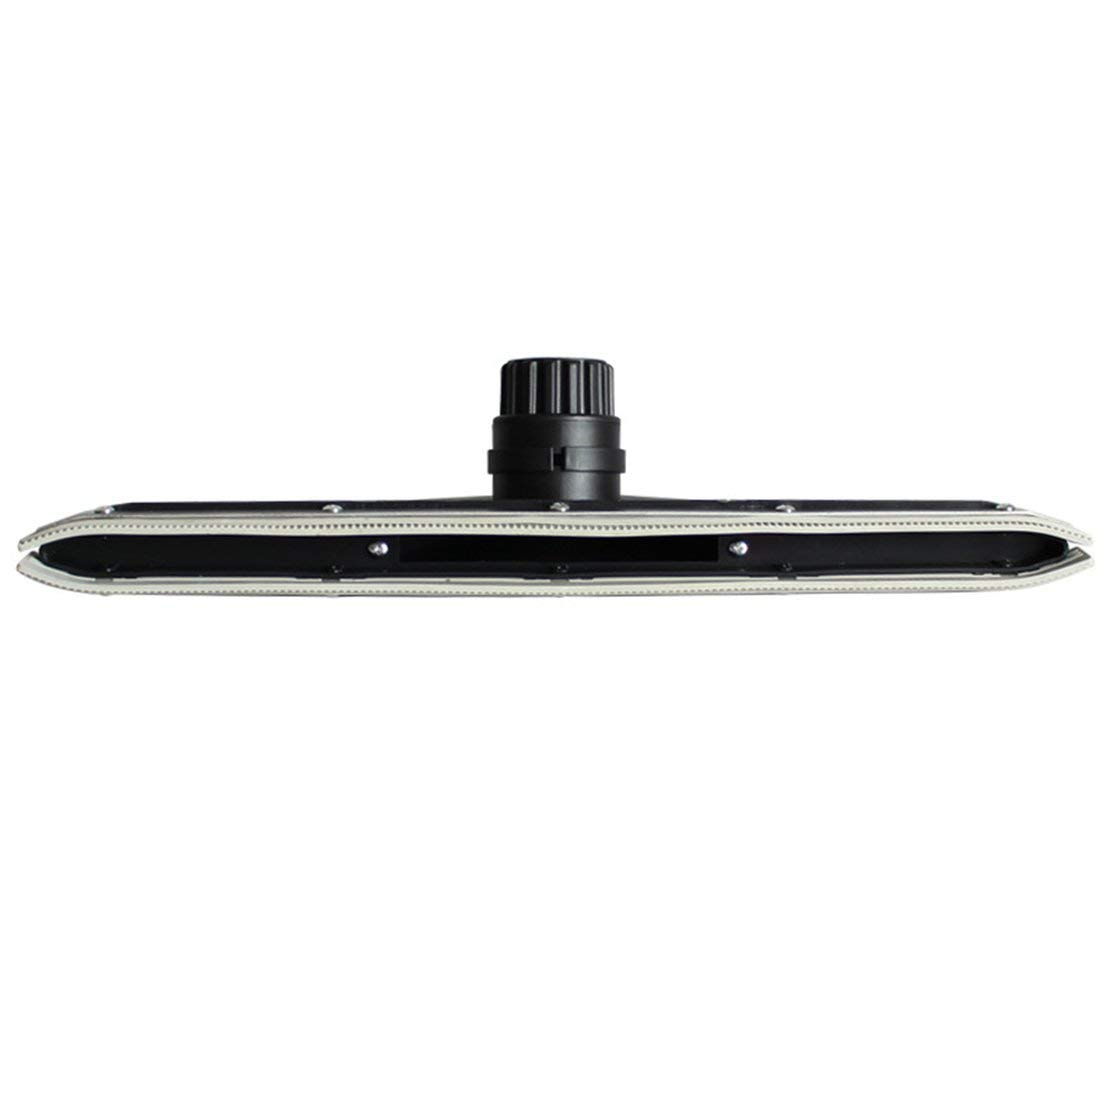 Accesorios para aspiradoras Aspiradoras industriales Piezas de repuesto Aspirador de agua Cabezal de aspiraci/ón Di/ámetro interno 37 mm